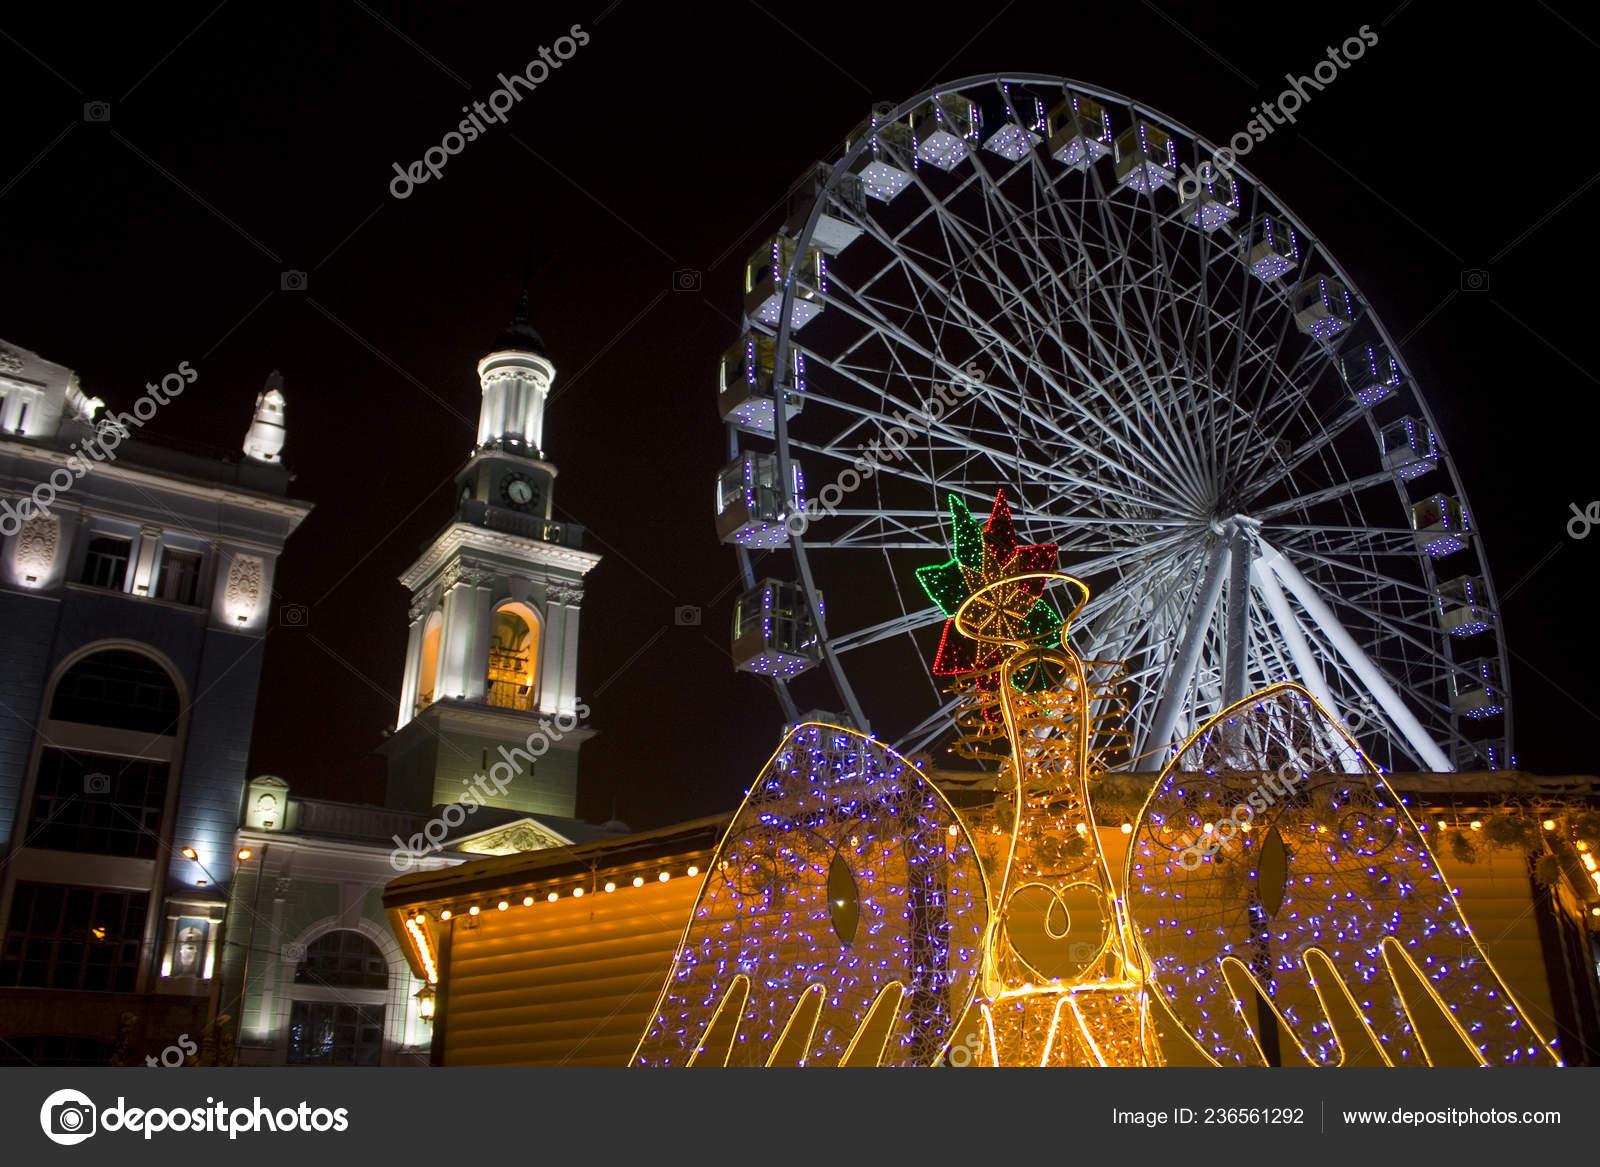 Kyiv Ukraine January 6 2019 The Ferris wheel and Christmas decoration at the Kontraktova Square on Podil in Kyiv